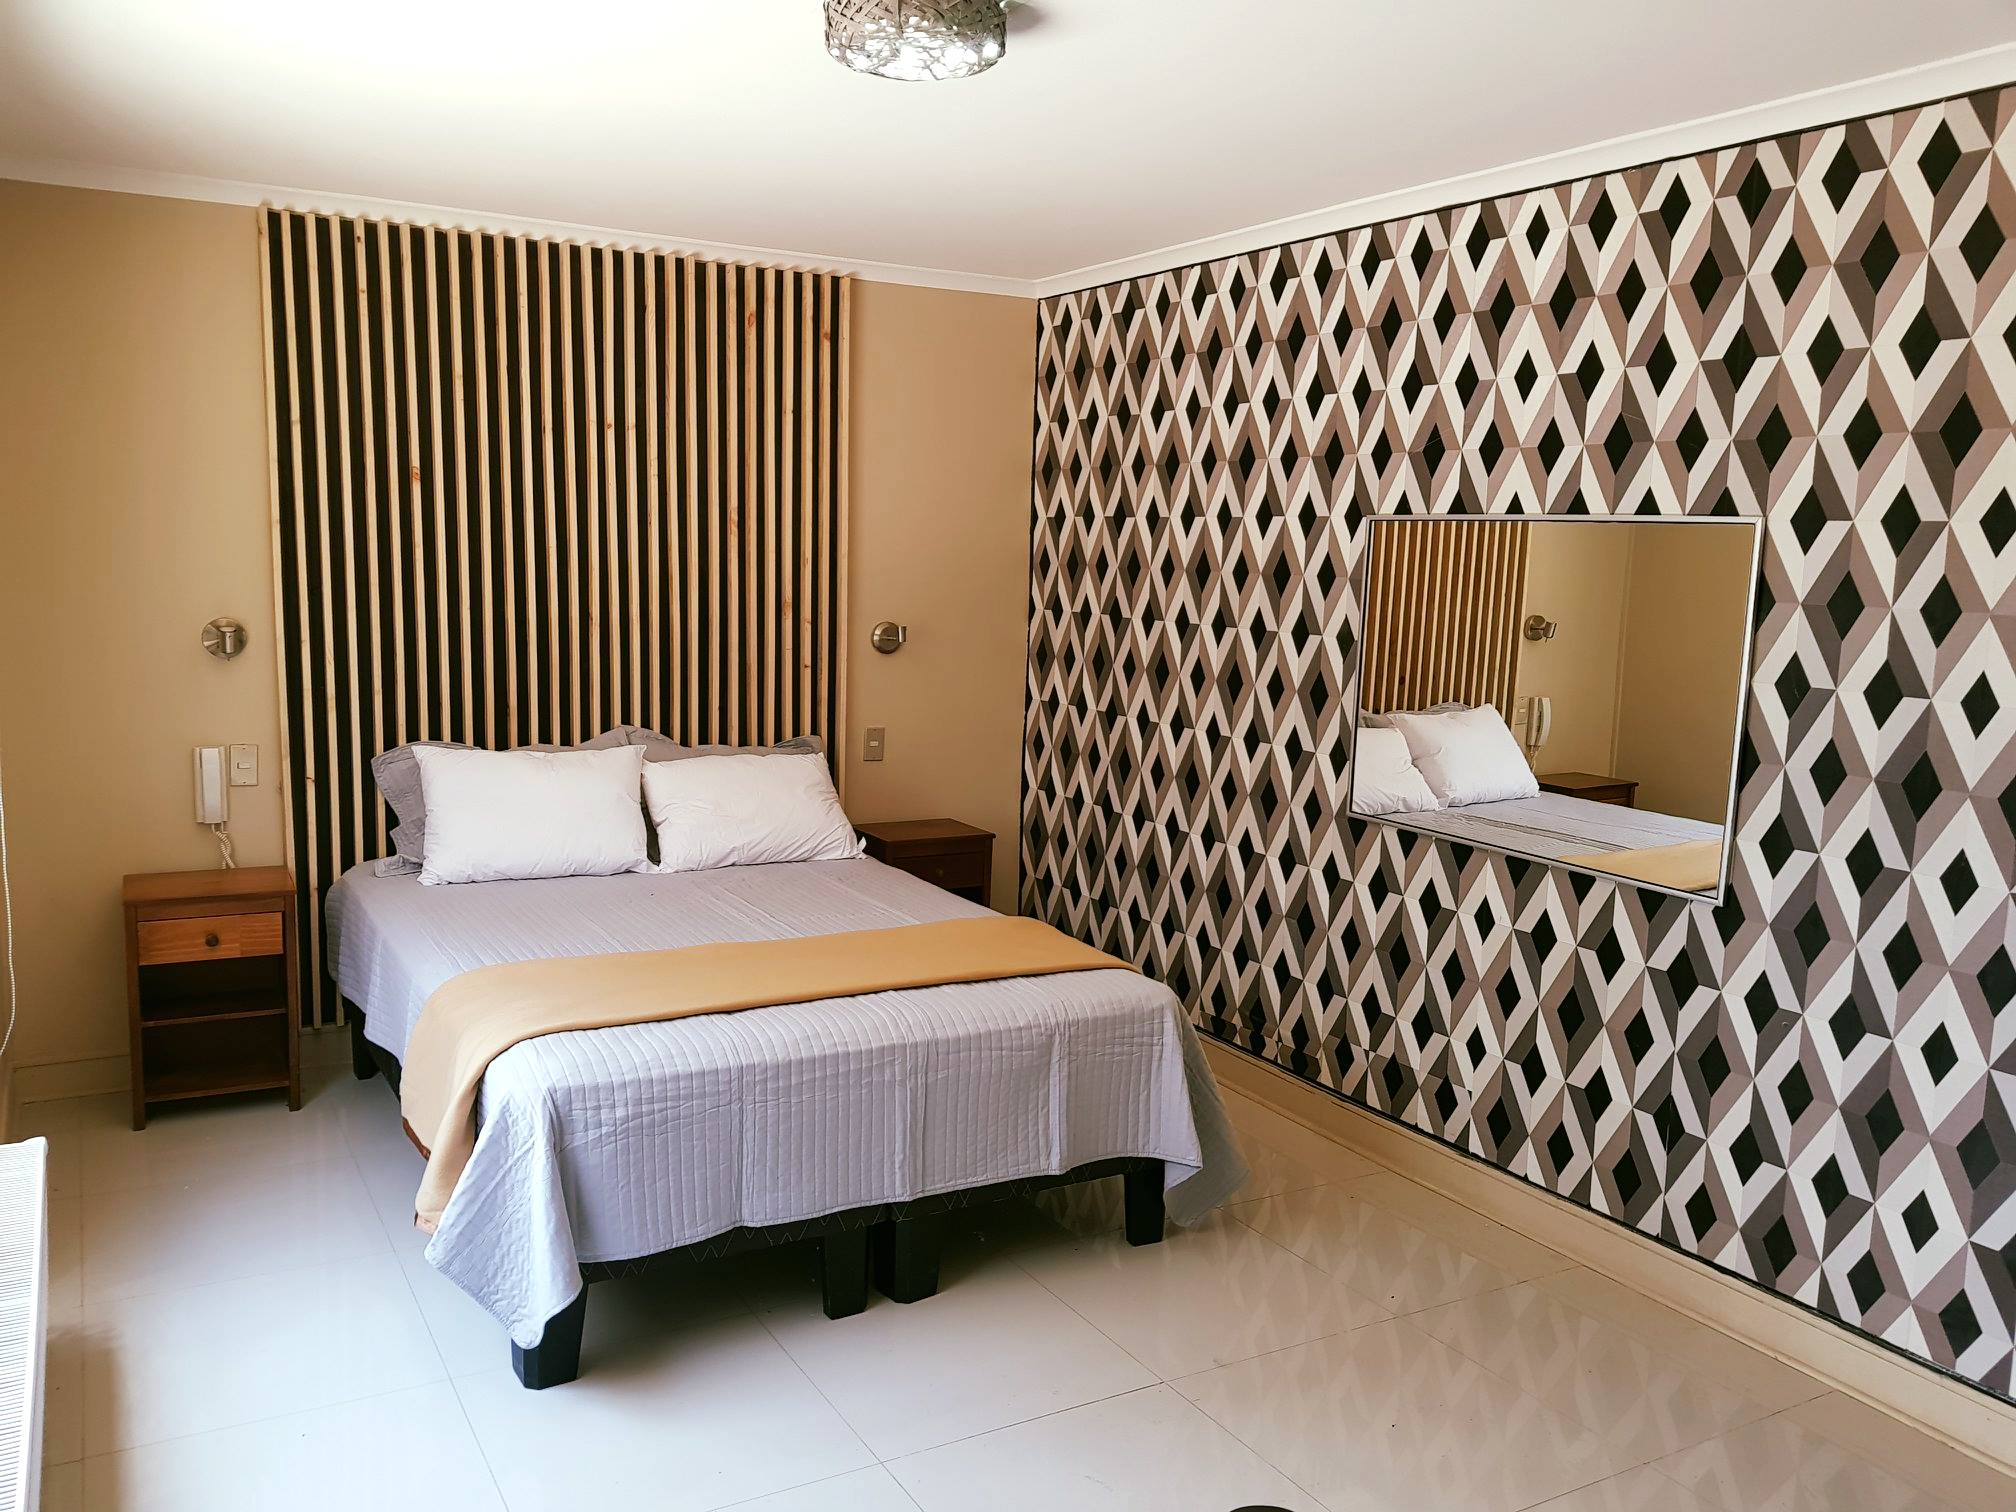 M Motel en Limache : MotelNow